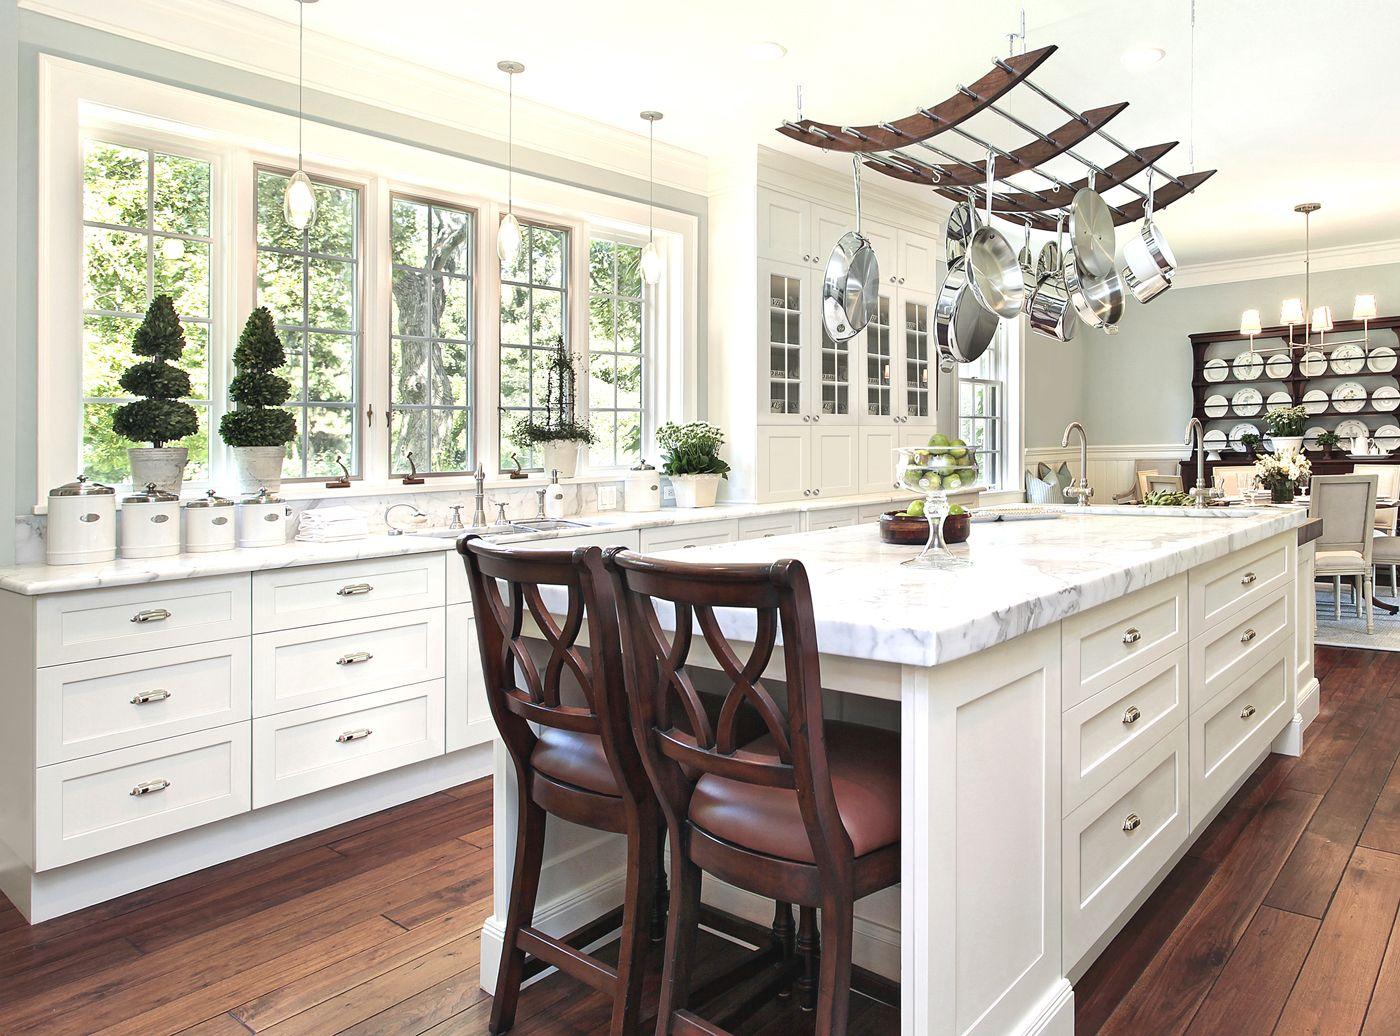 White Kitchen Cabinets Liquidators Furnished With Hanging Pot Rack Kitchen Remodel Modern Shaker Kitchen Shaker Kitchen Cabinets